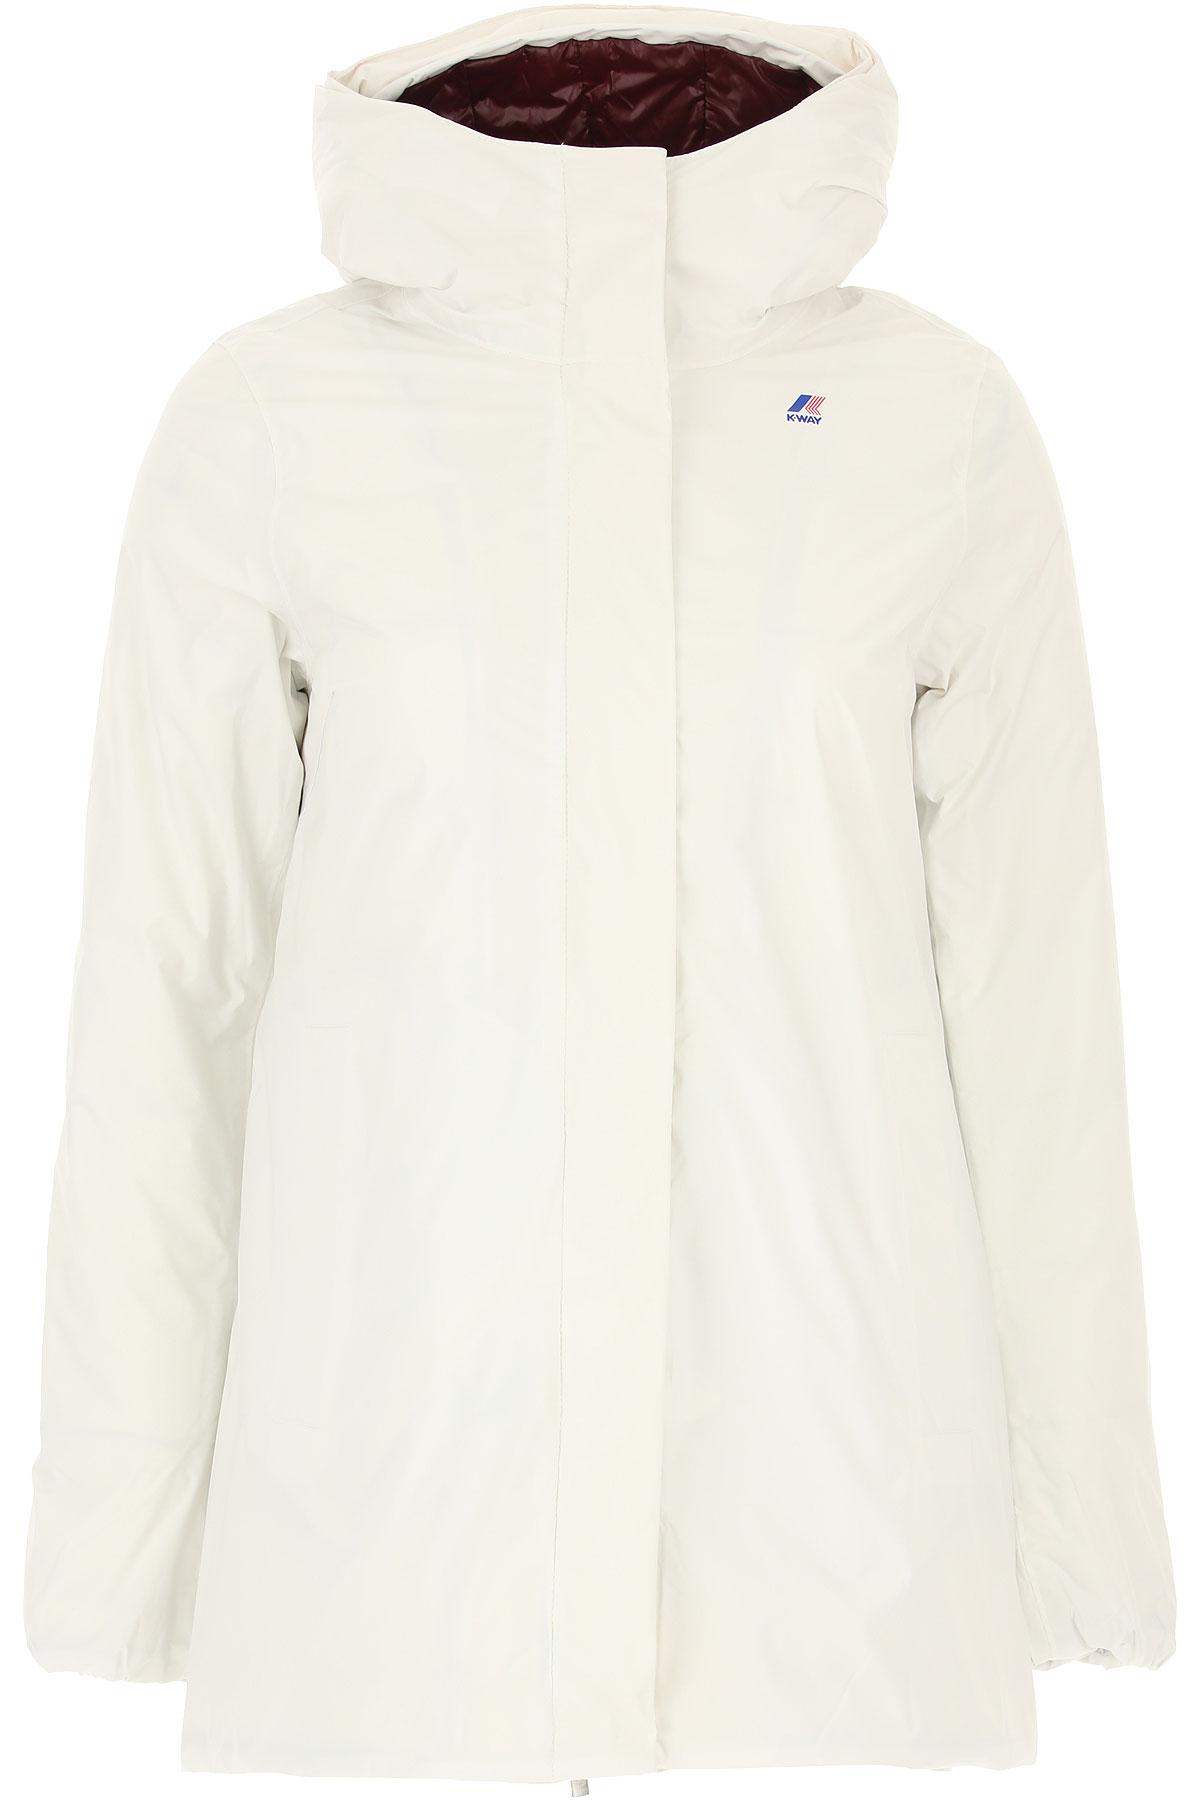 K-Way Down Jacket for Women, Puffer Ski Jacket On Sale, White, polyamide, 2019, 40 44